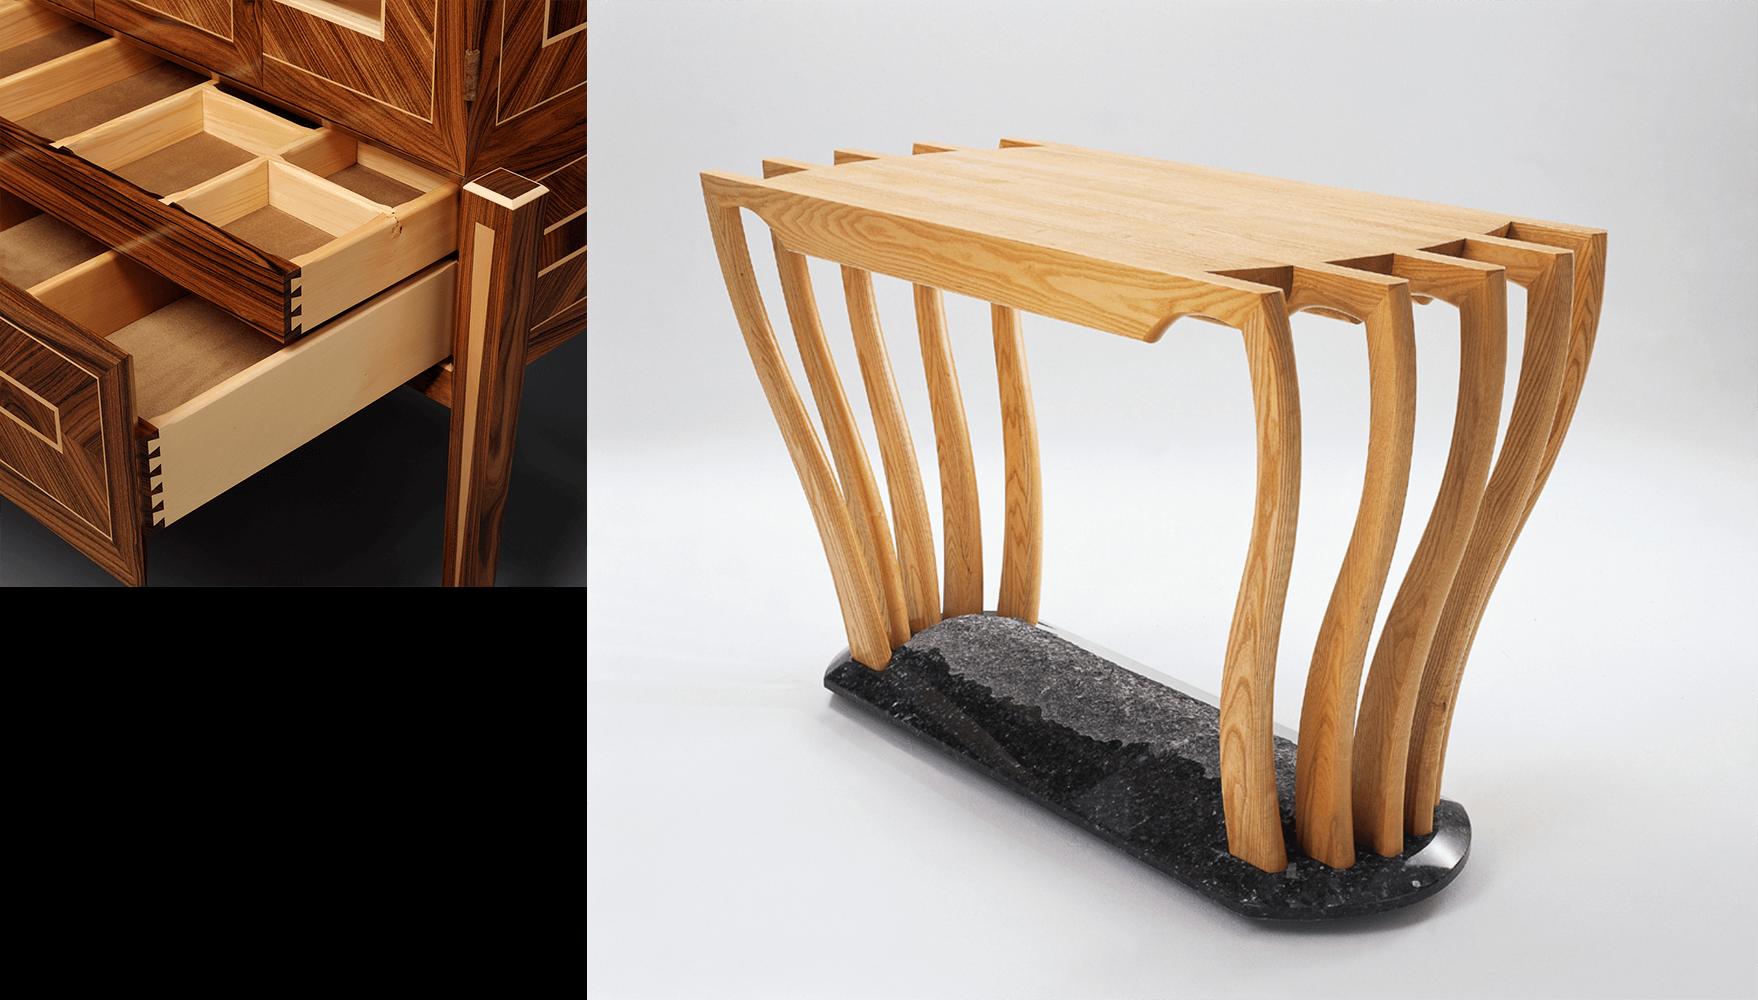 Liturgical Furniture piece by custom designer-maker Gray Hawk